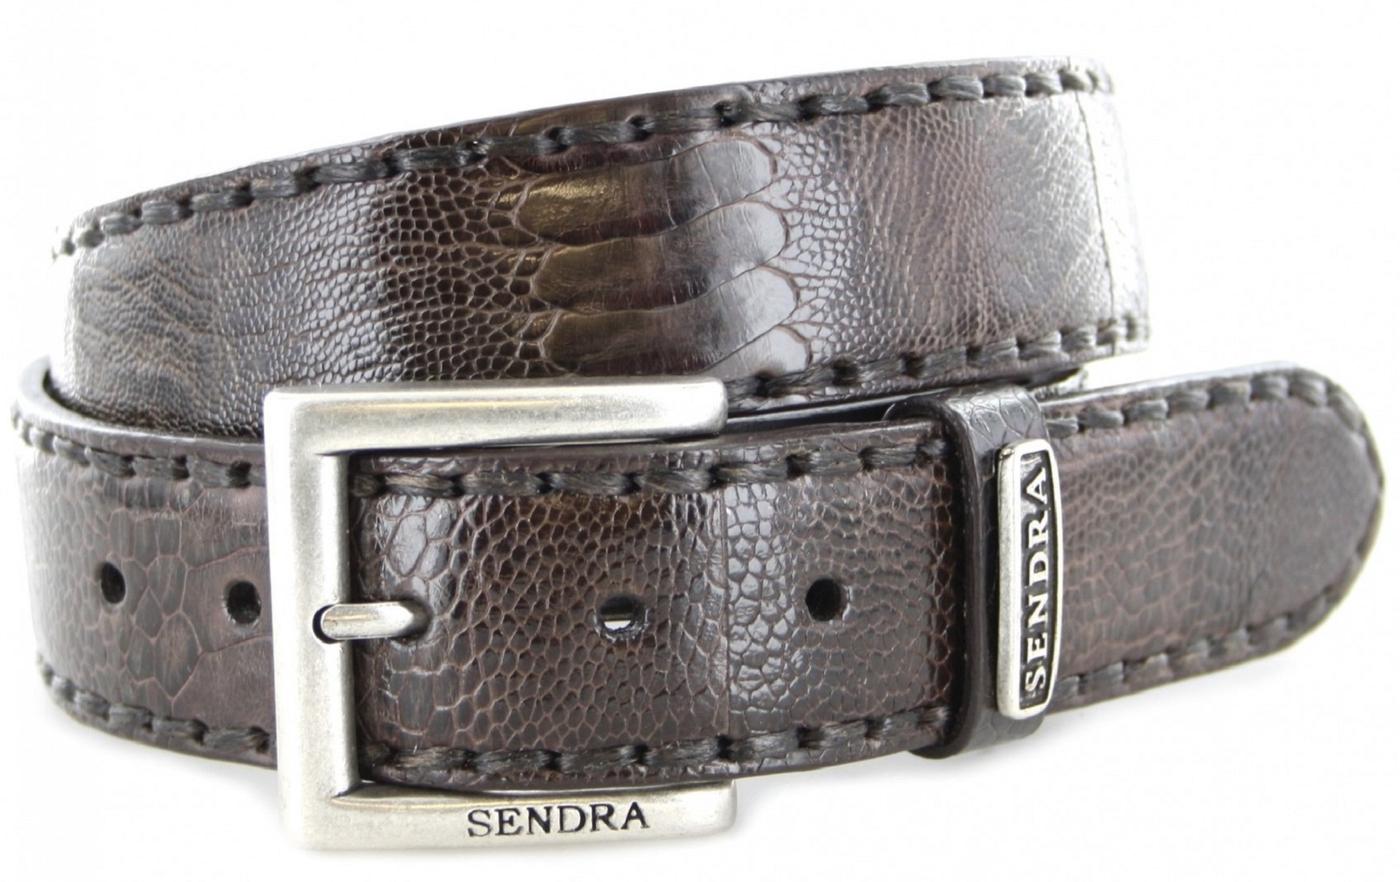 Sendra Boots 1016 Niger Exotic  leather belt - dark brown